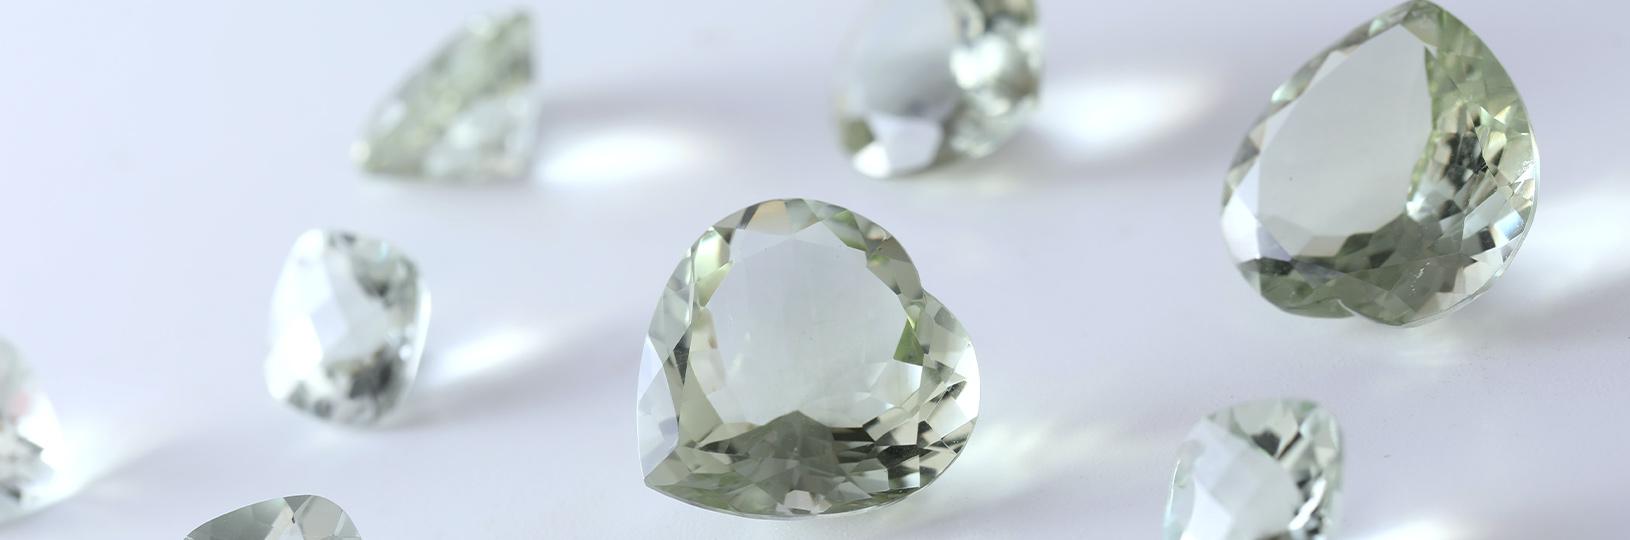 A closeup image of lab grown diamonds